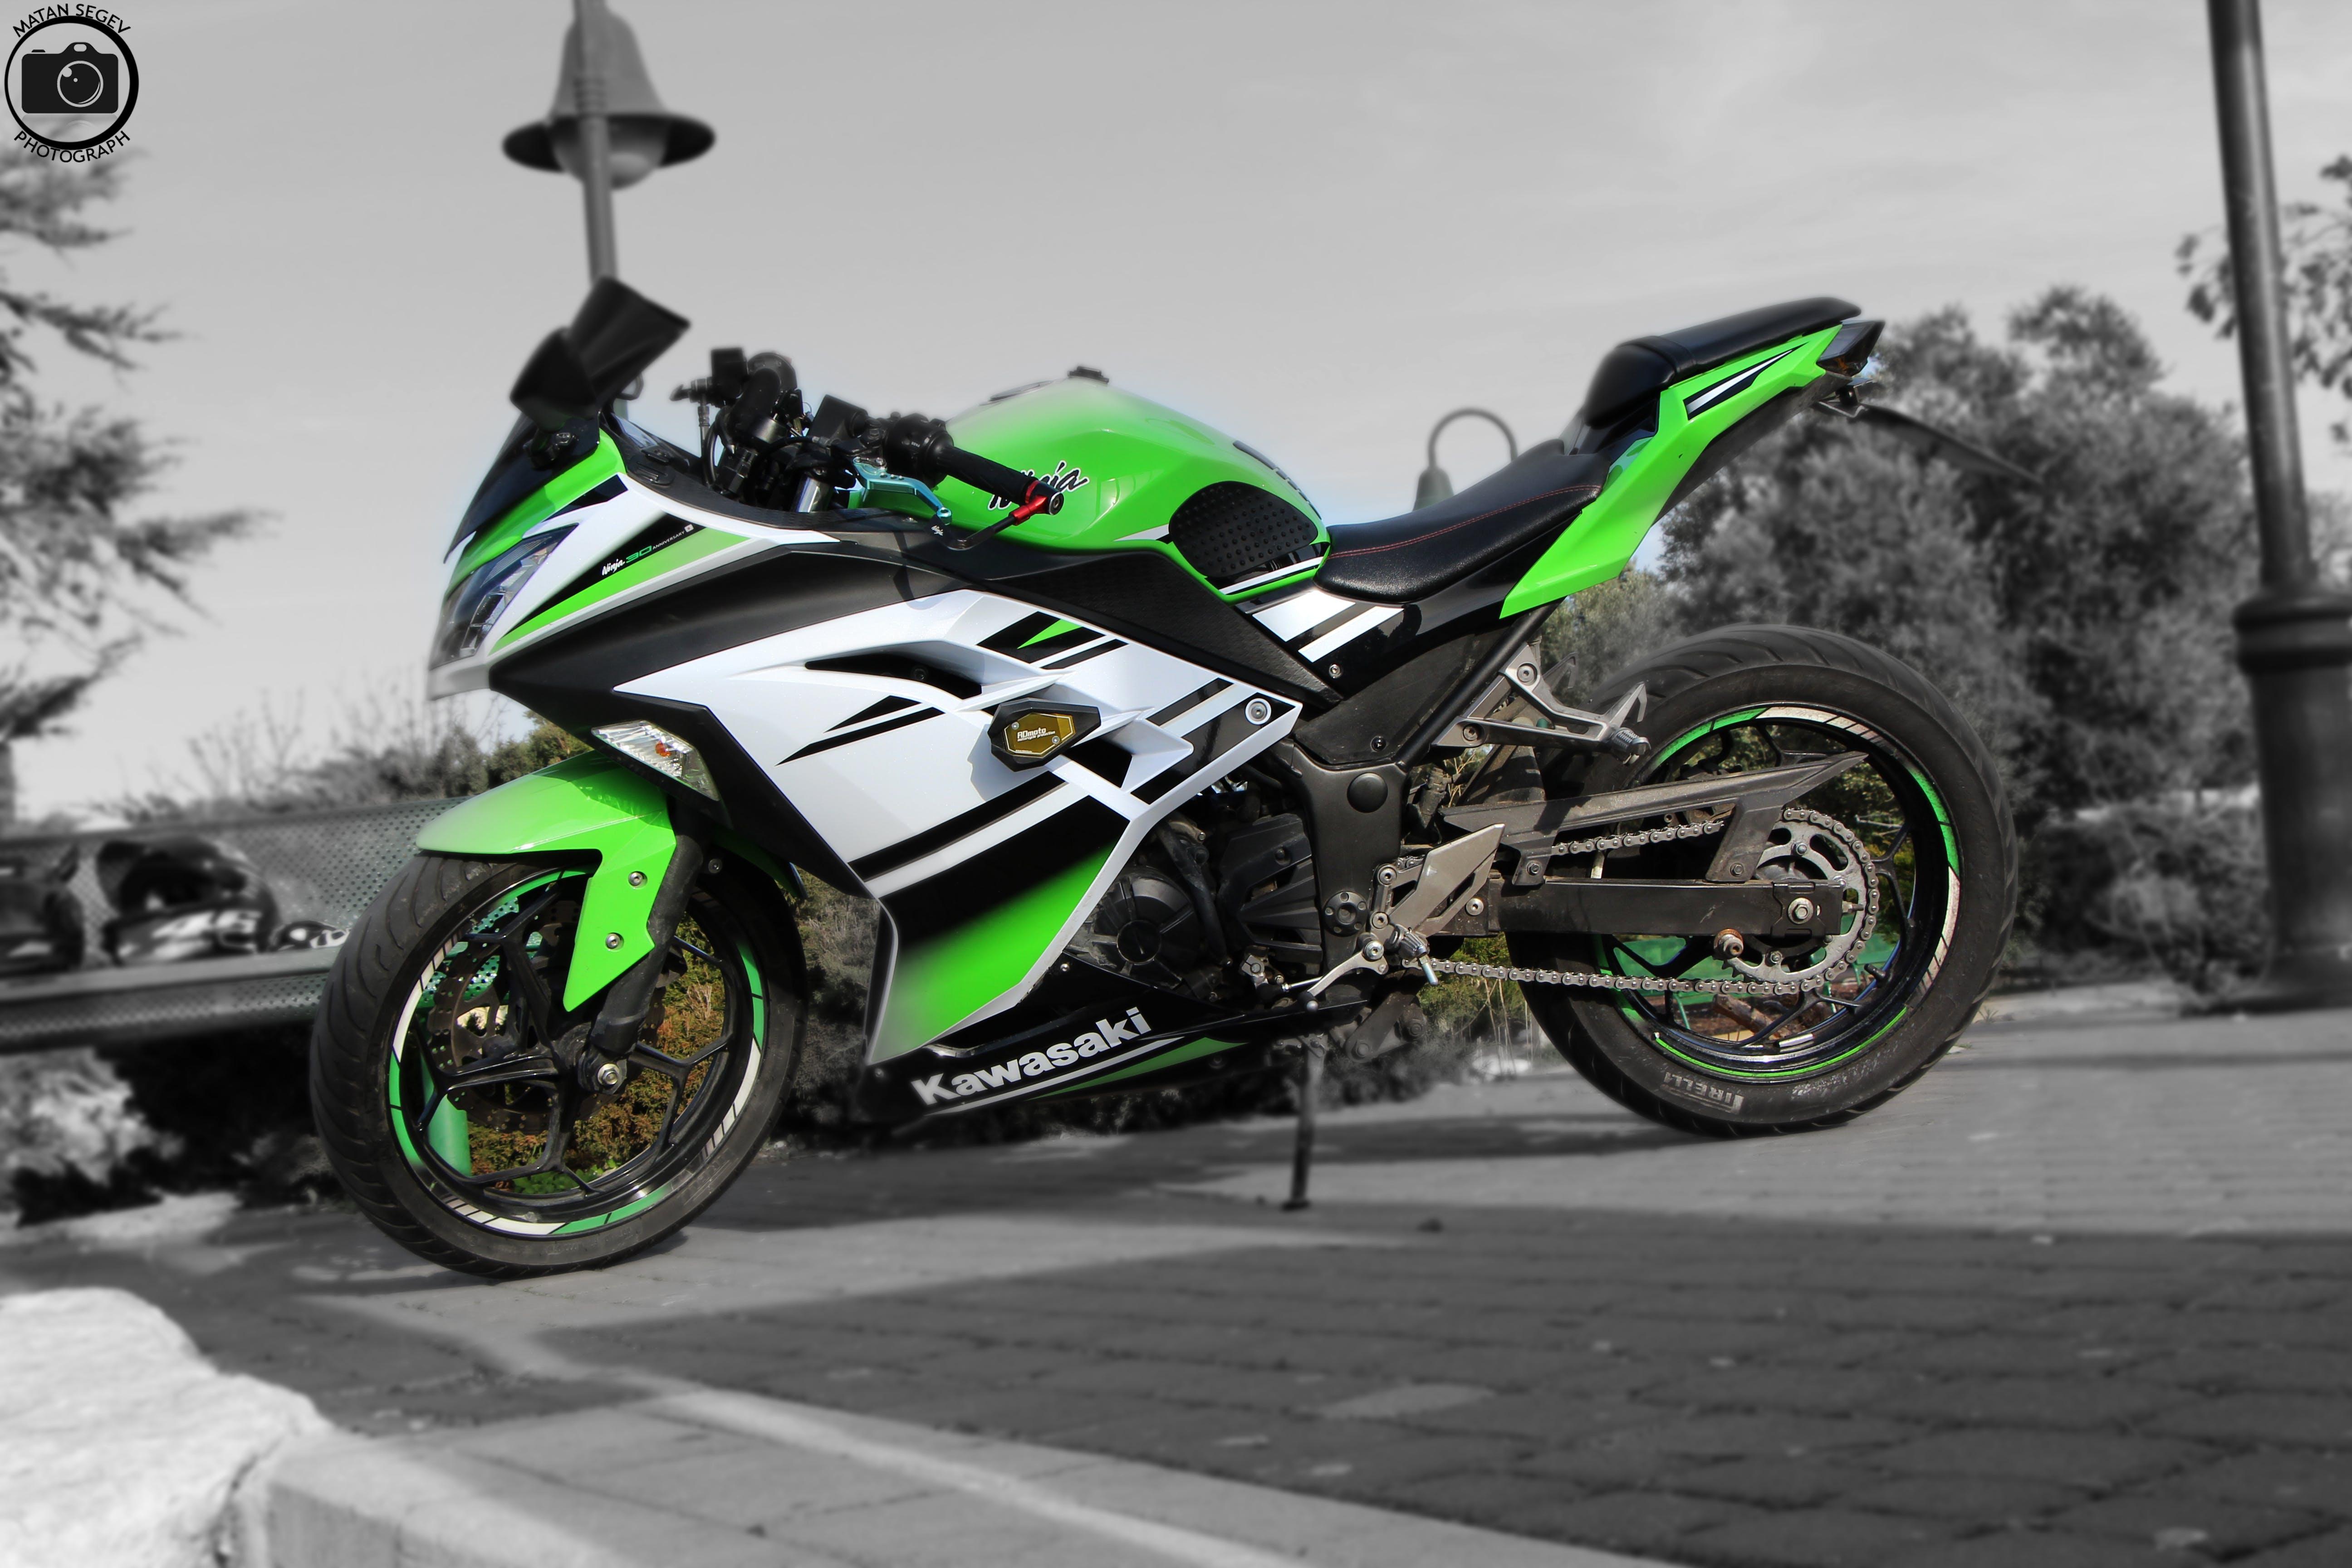 Free stock photo of motorcycle, motorcycle engine